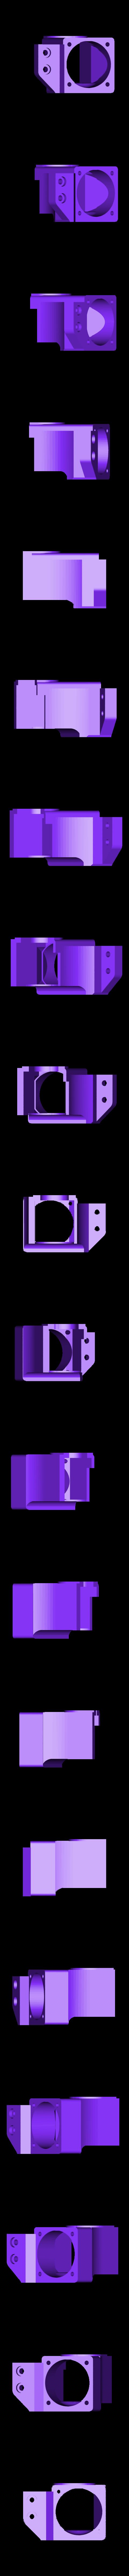 hotendfan30mmREV2.stl Download free STL file CR10 direct heavy duty mod, titan + v5heatsink+volcano/ or / v6heatsink + pancake motor BETA • 3D print object, raffosan